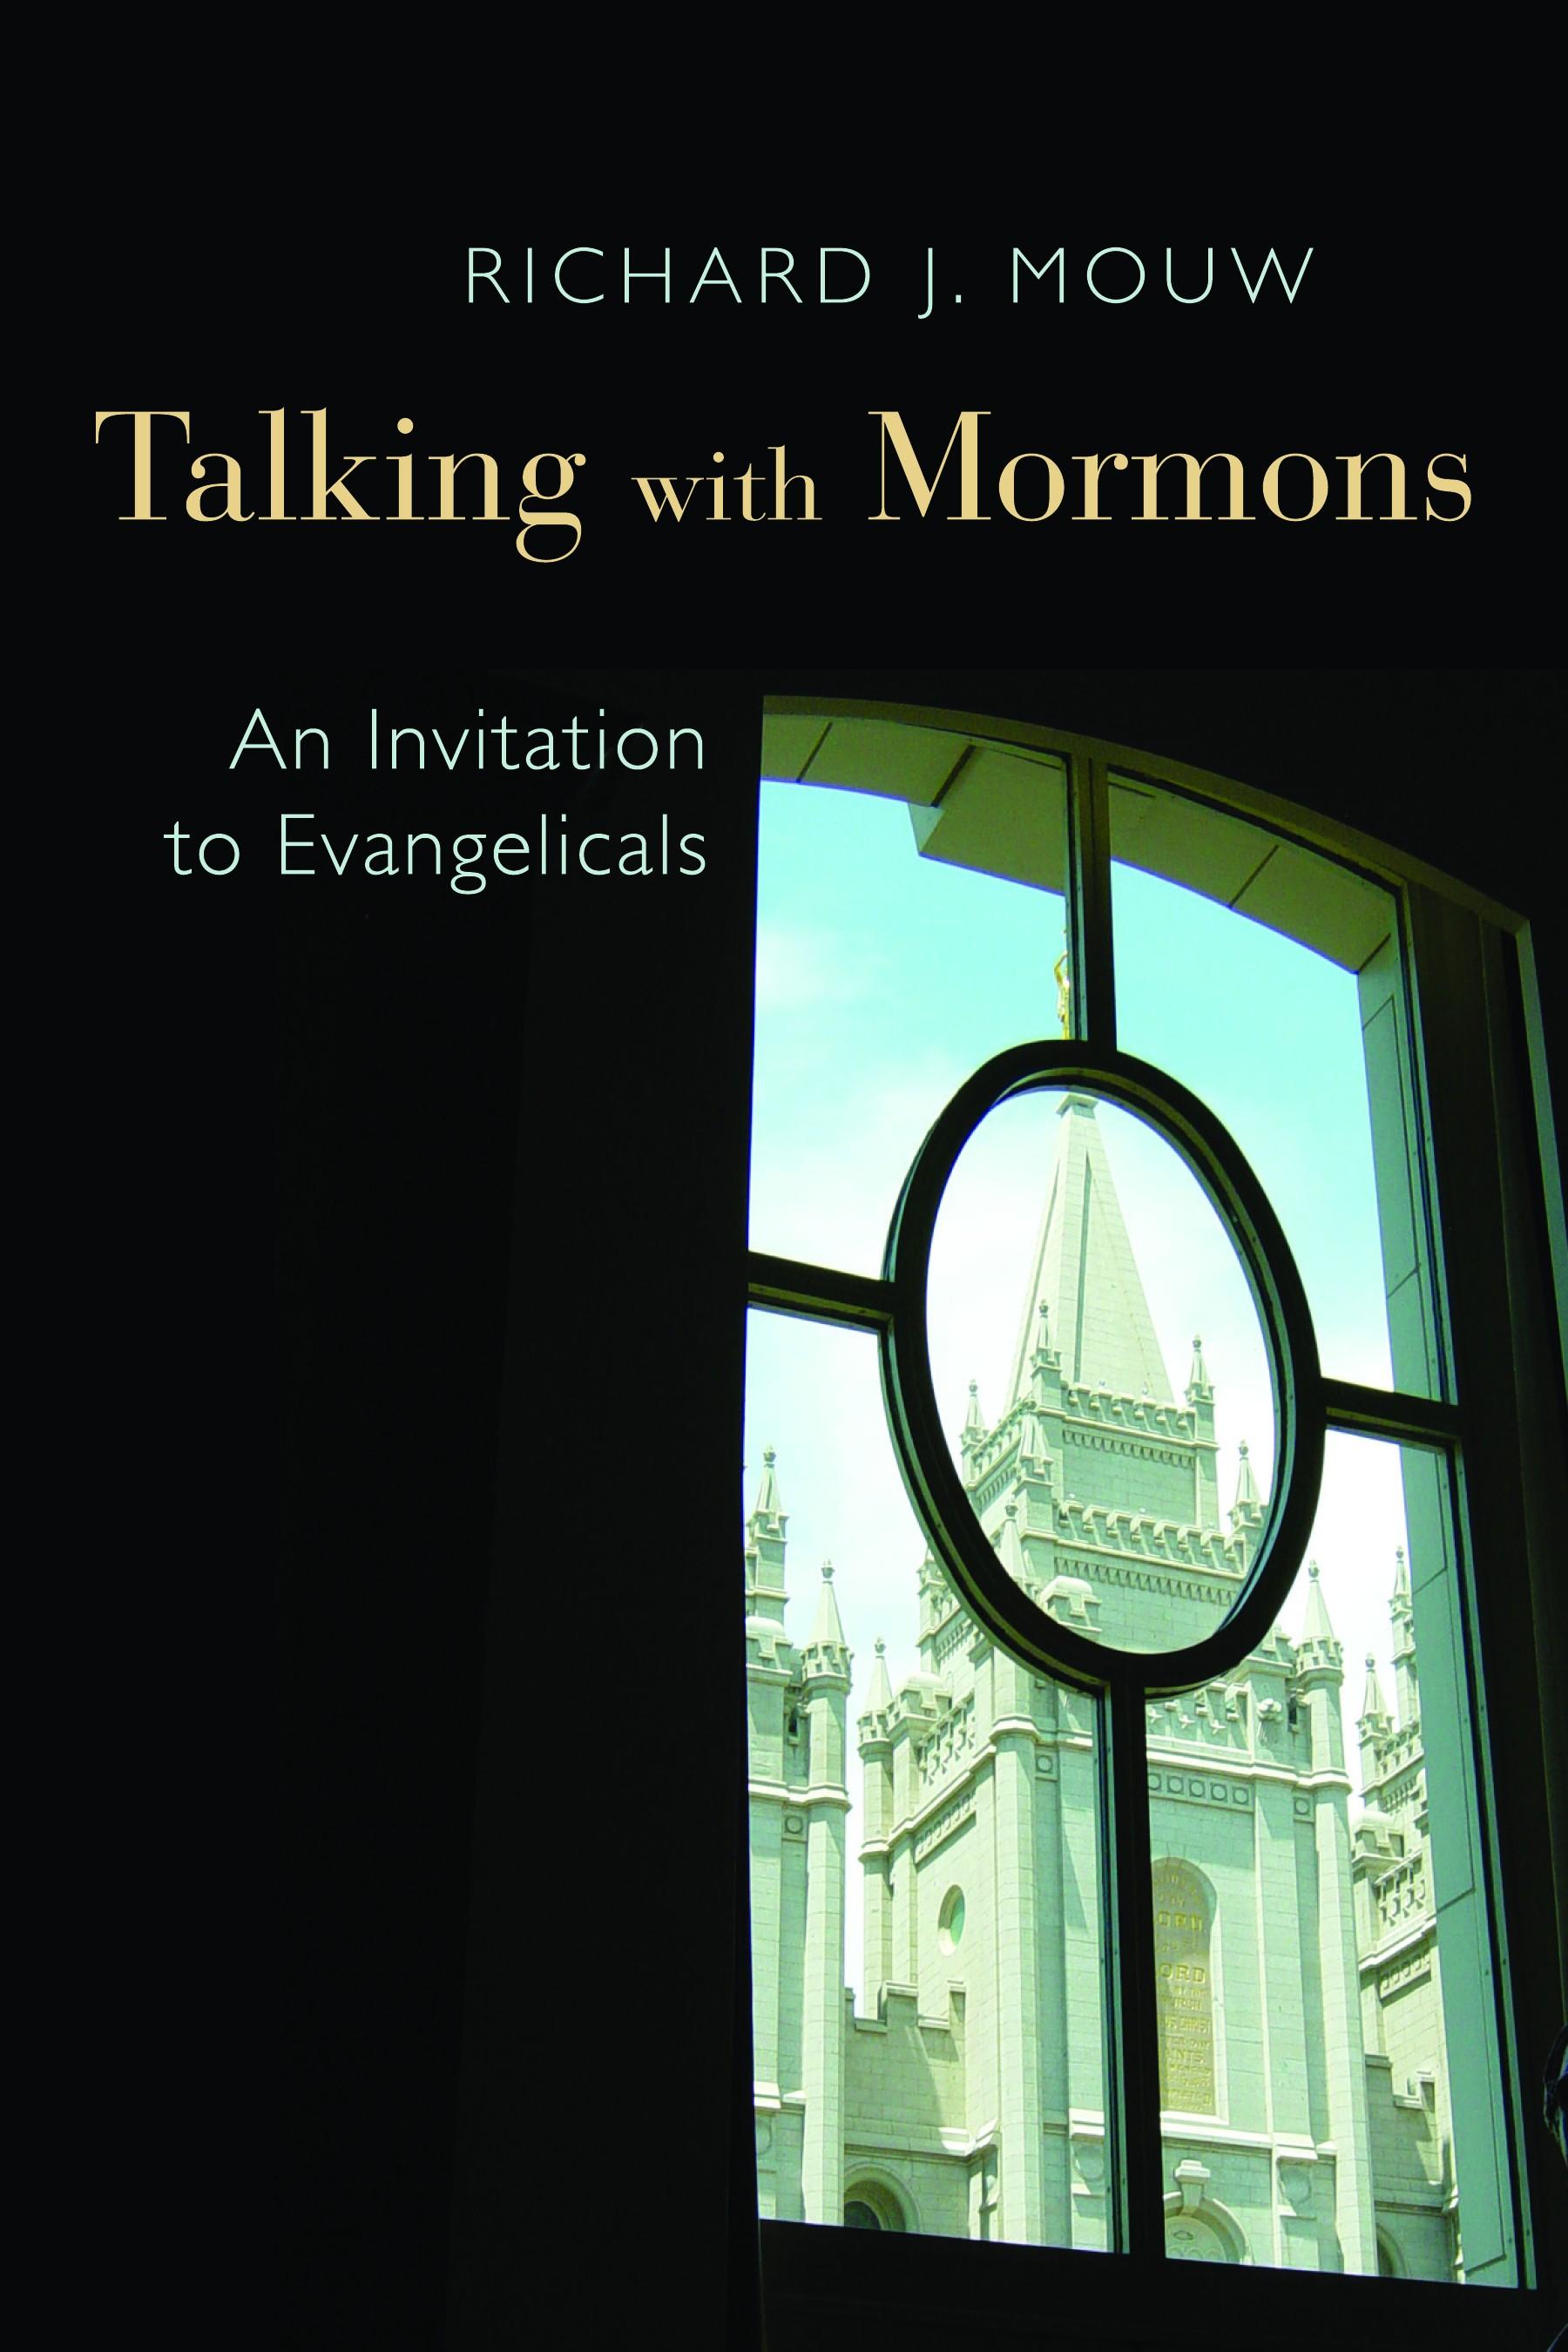 mormons book cover